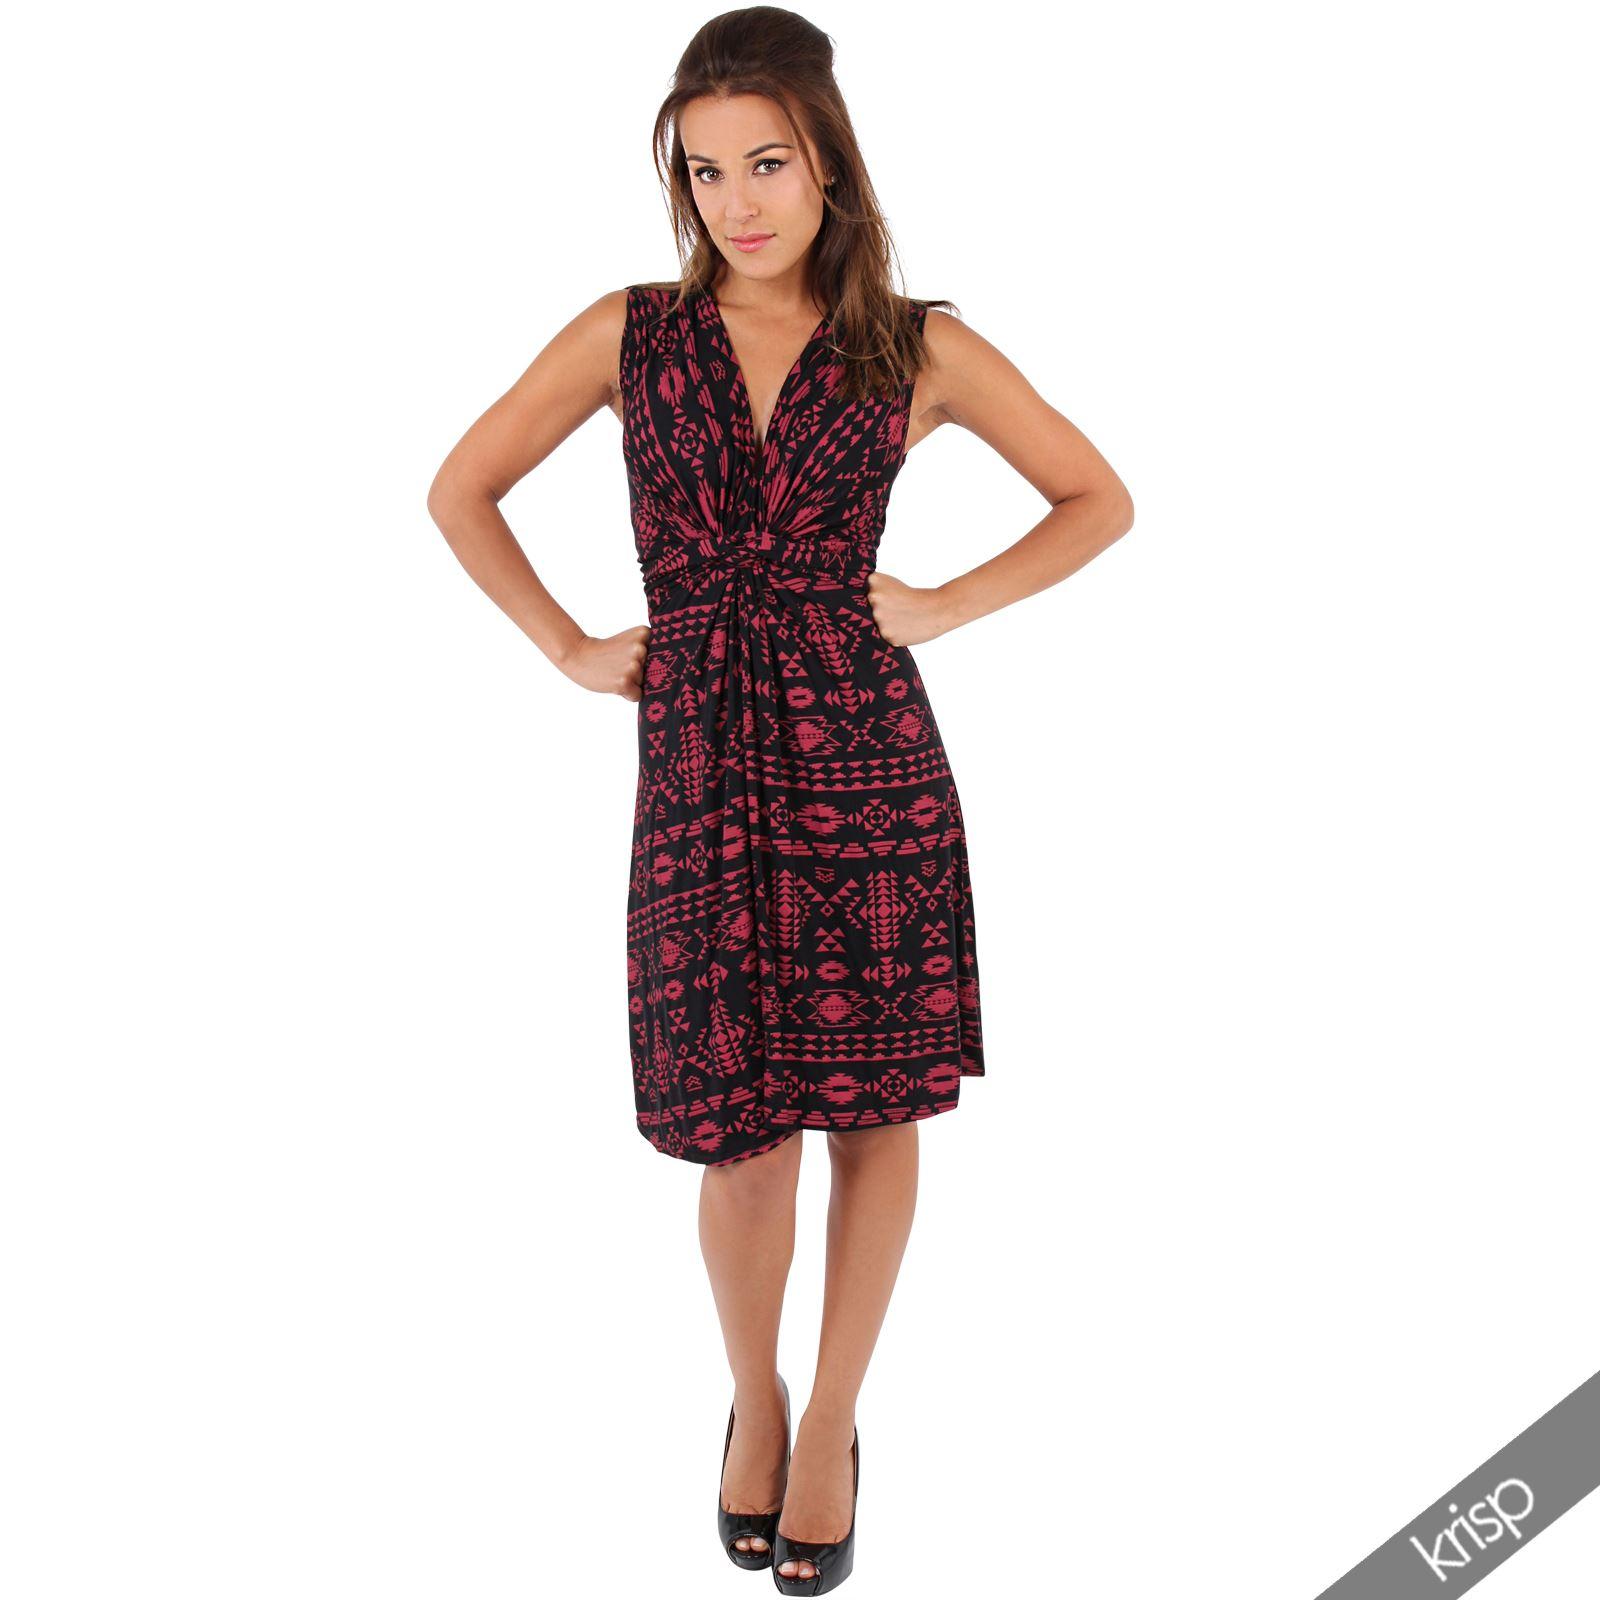 Womens-V-Neck-Mini-Dress-Small-Sizes-Short-Skirt-Tribal-Print-Front-Knot-Party thumbnail 24